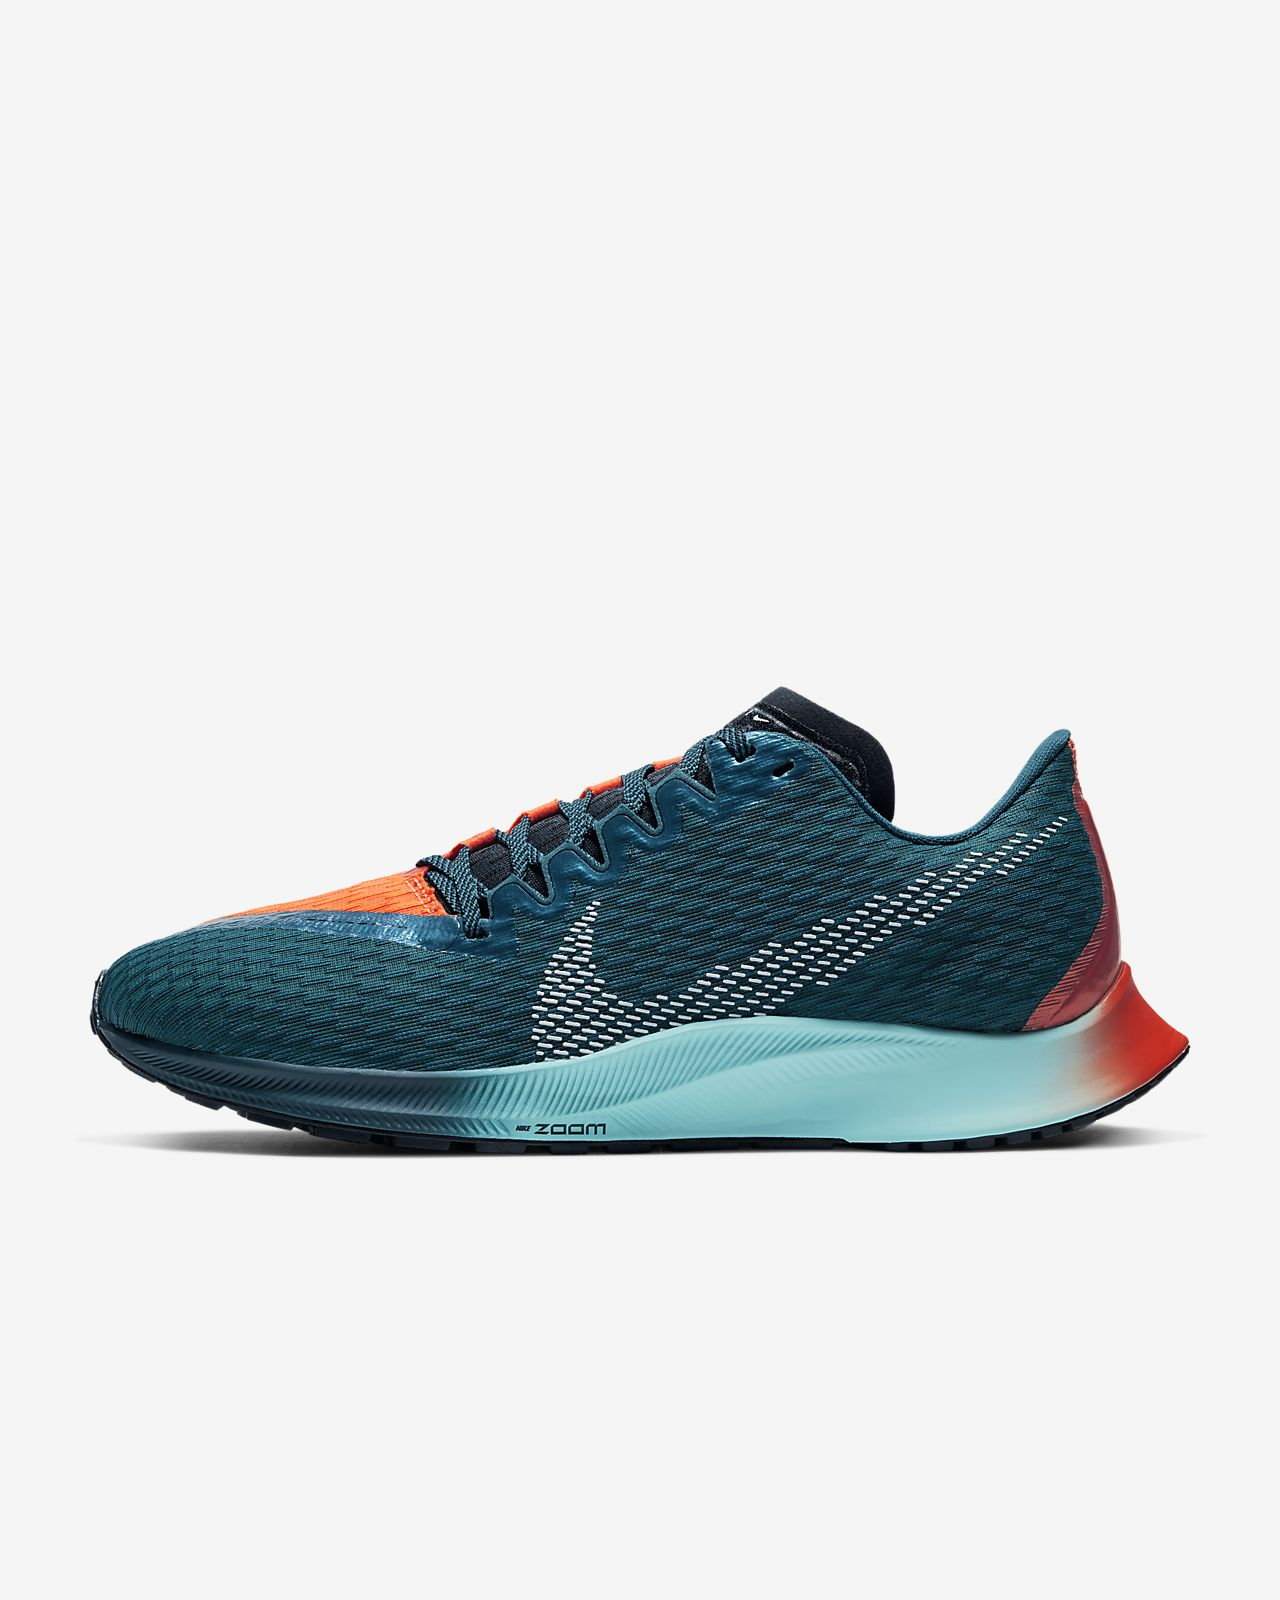 Nike Zoom Fly Női futócipő | Atletikashop